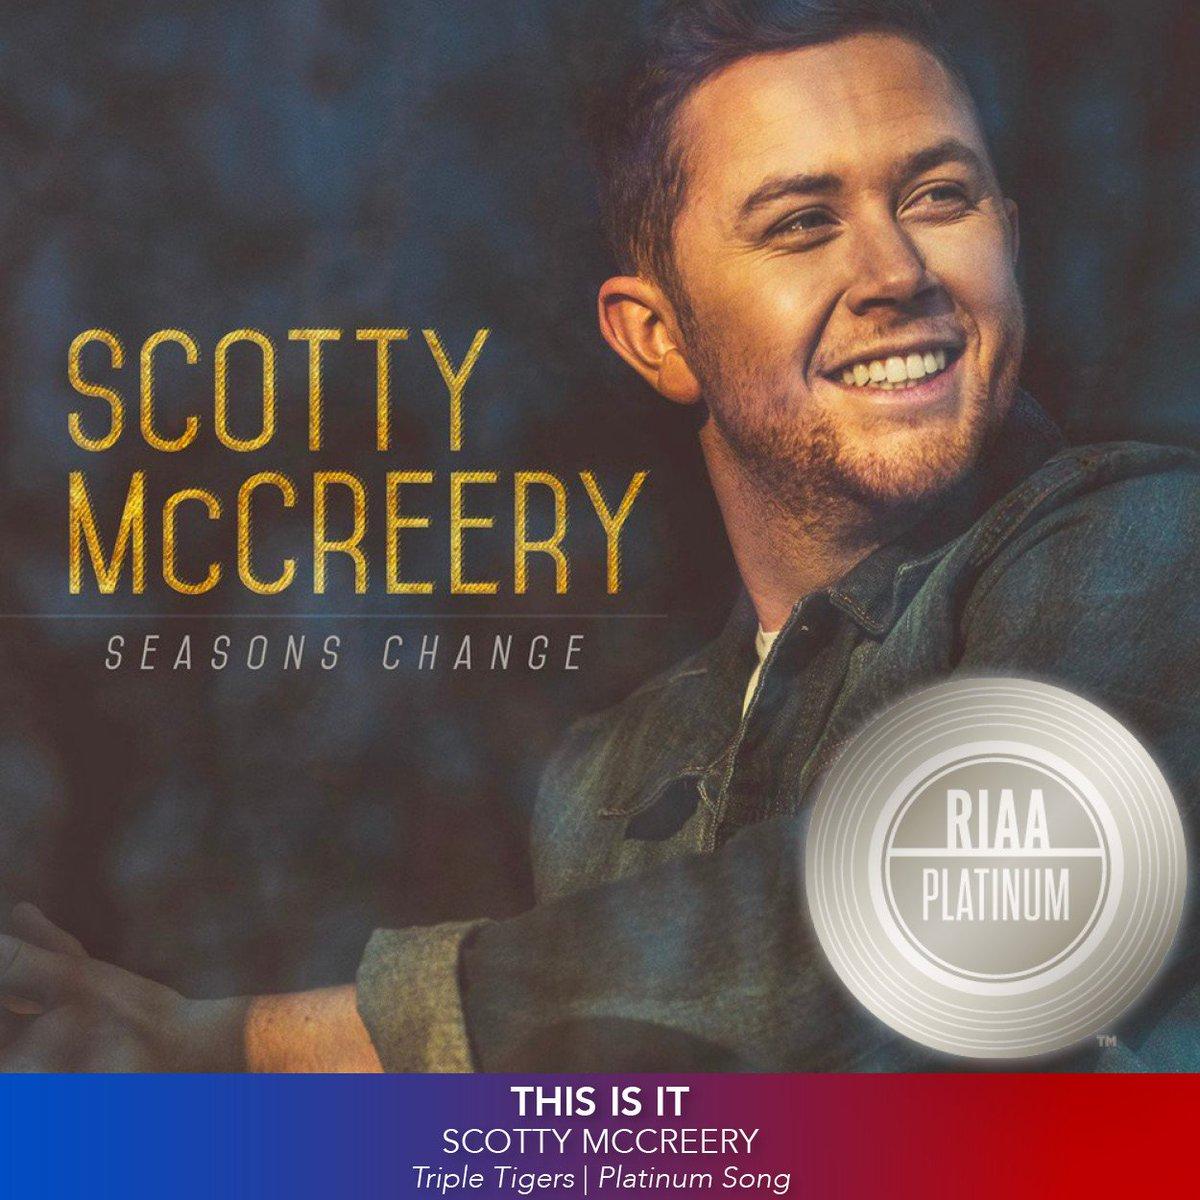 Platinum songs for @taylorswift13, @ScottyMcCreery, @billieeilish, @MorganWallen, @blakeshelton & more bit.ly/RIAAjuly2019